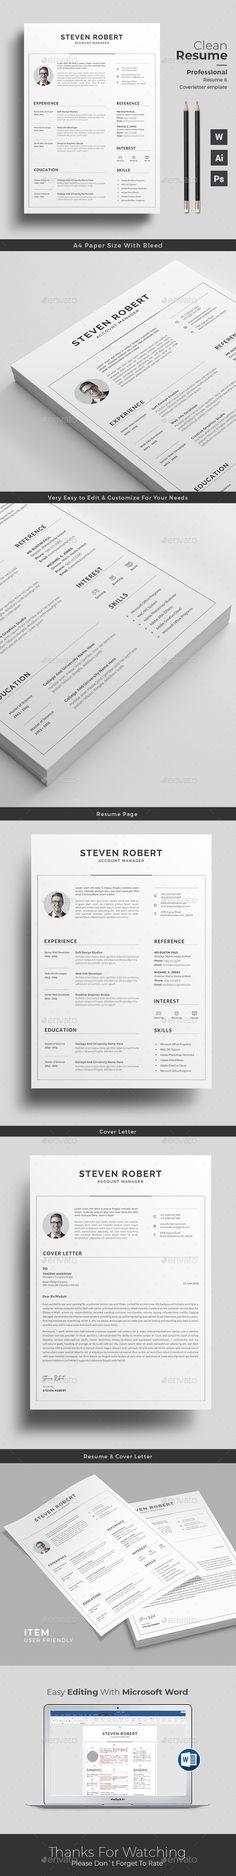 Resume Template PSD, AI Illustrator, MS Word